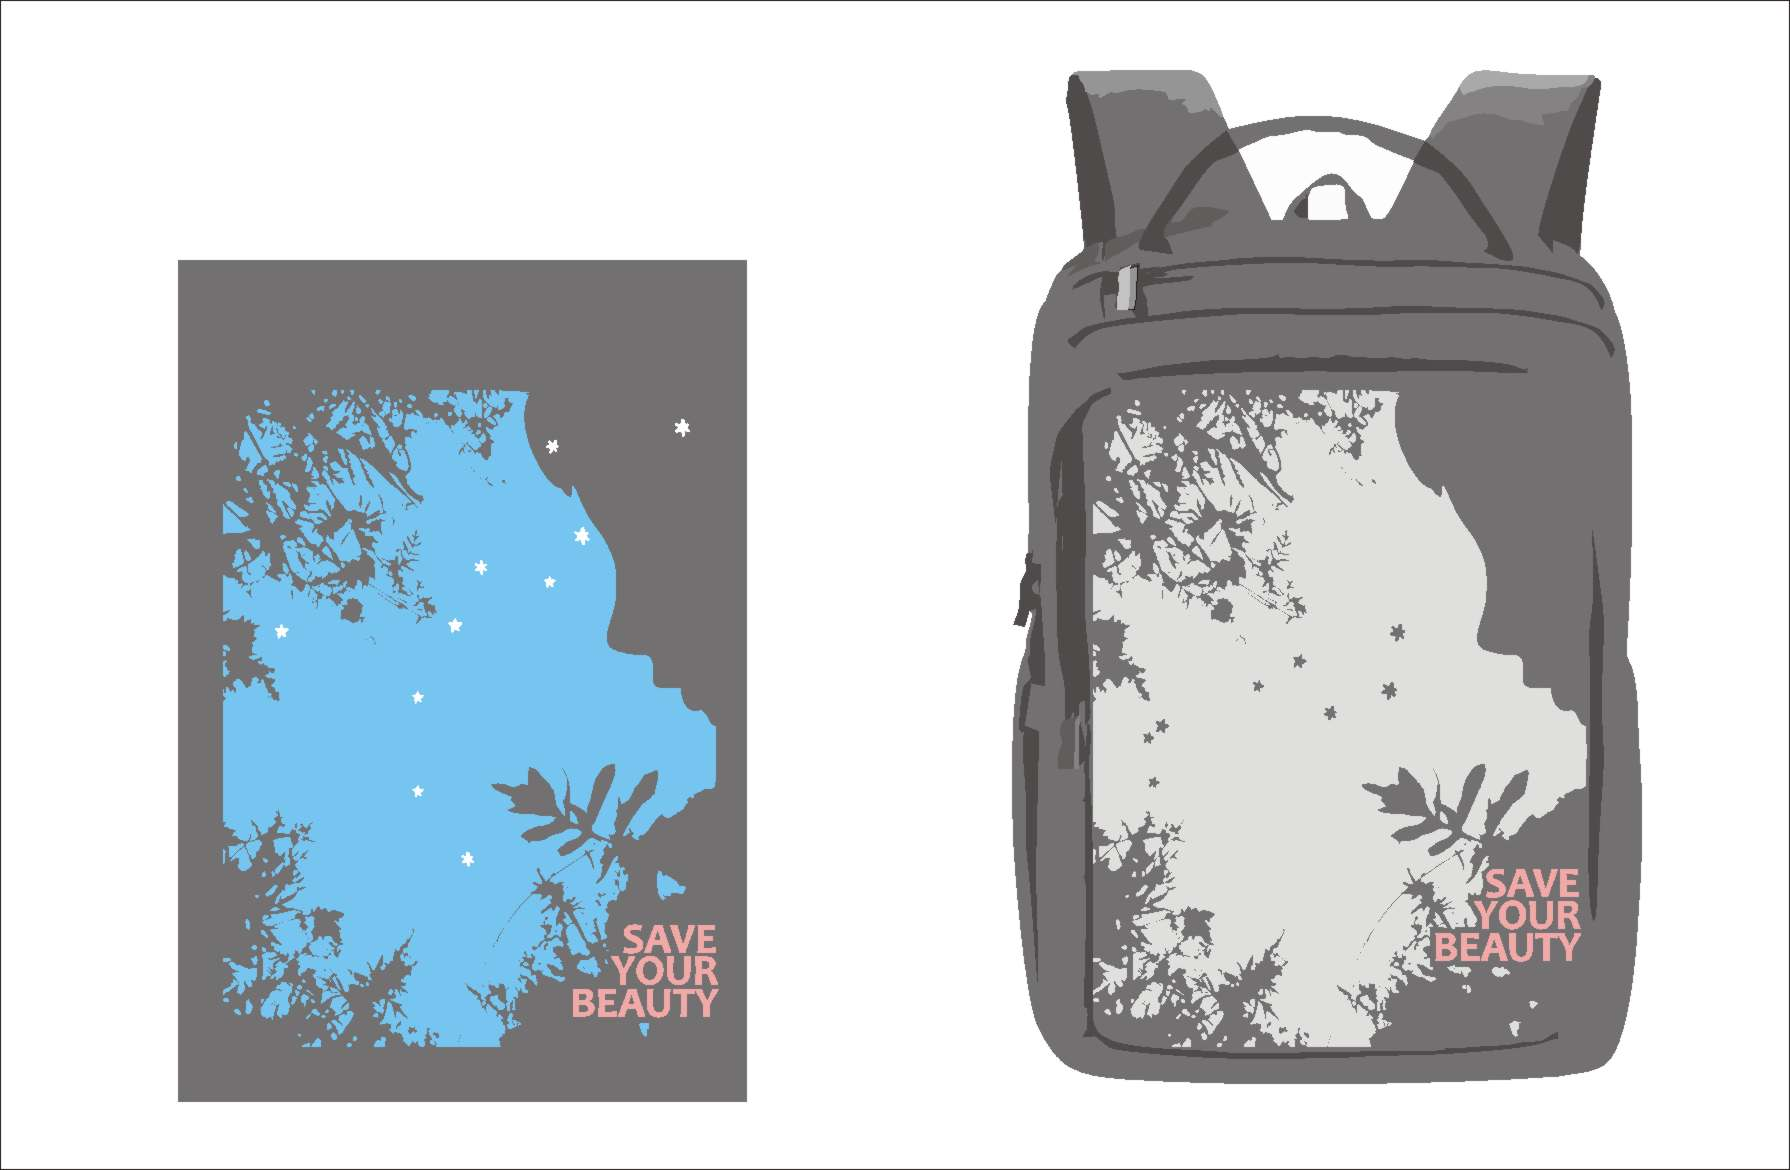 Конкурс на создание оригинального принта для рюкзаков фото f_4325f89e66ddf1b8.jpg